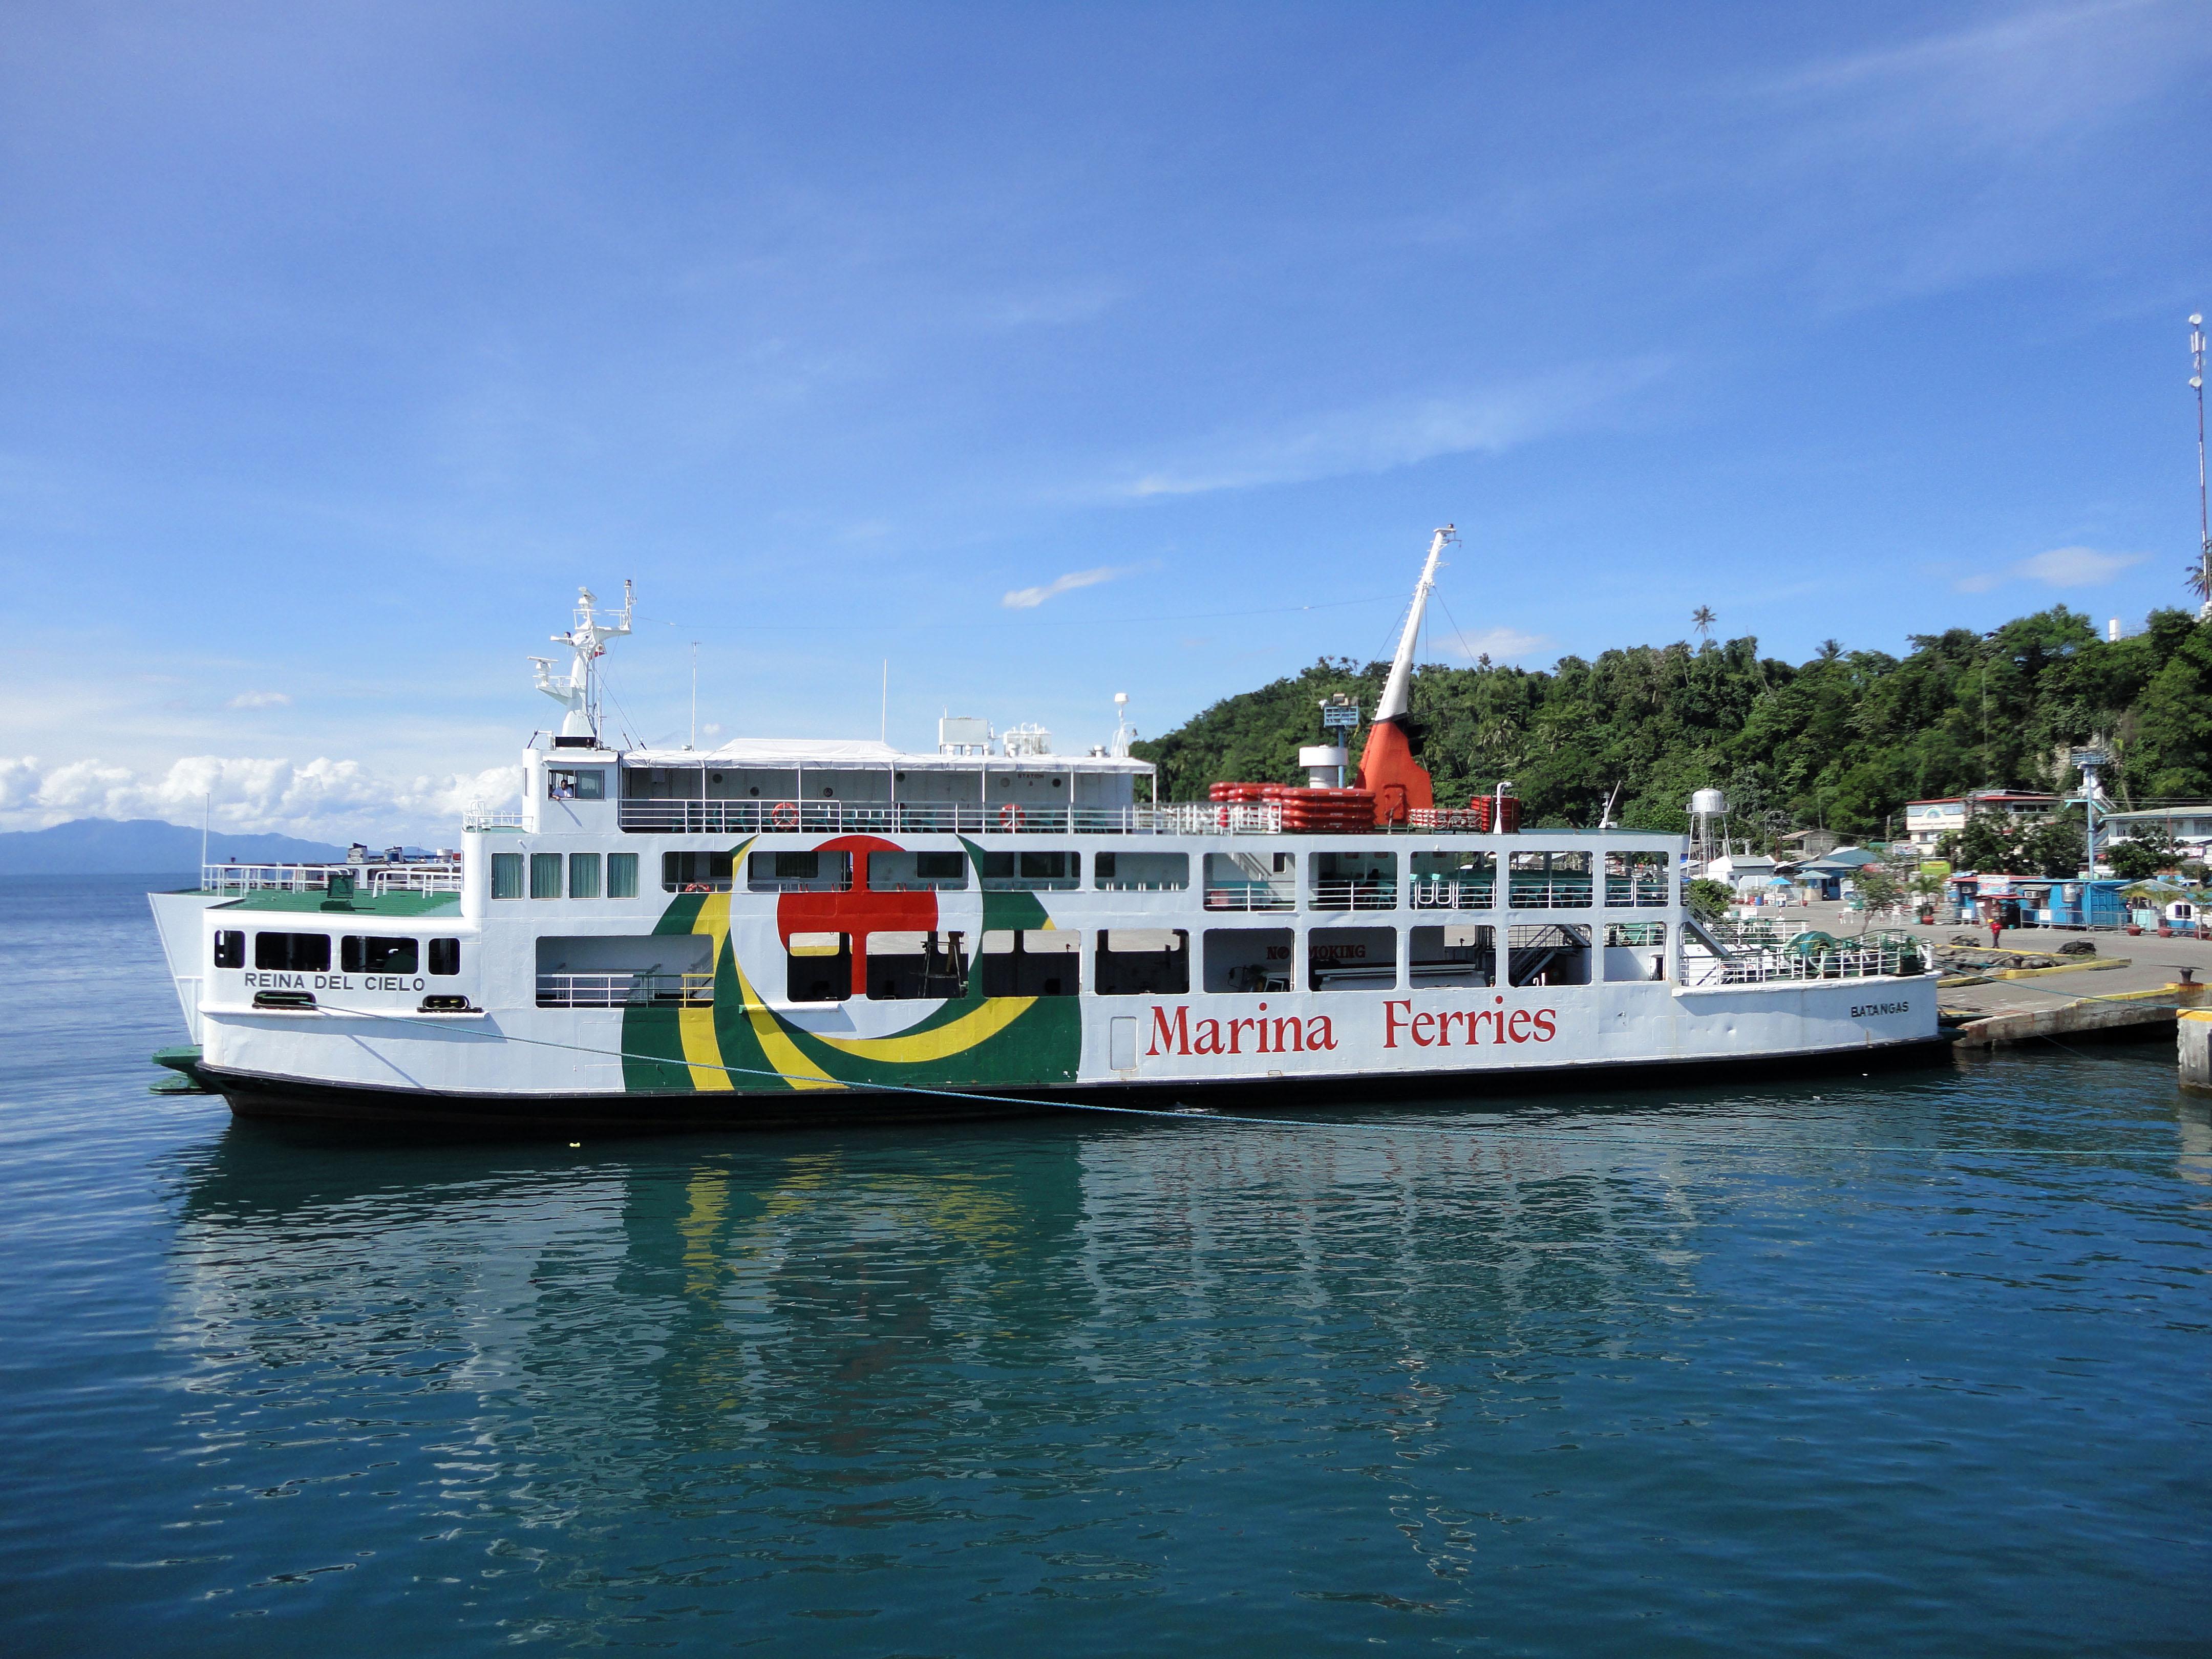 MV Reina Del Cielo Montenegro lines Calapan Pier Philippines 06